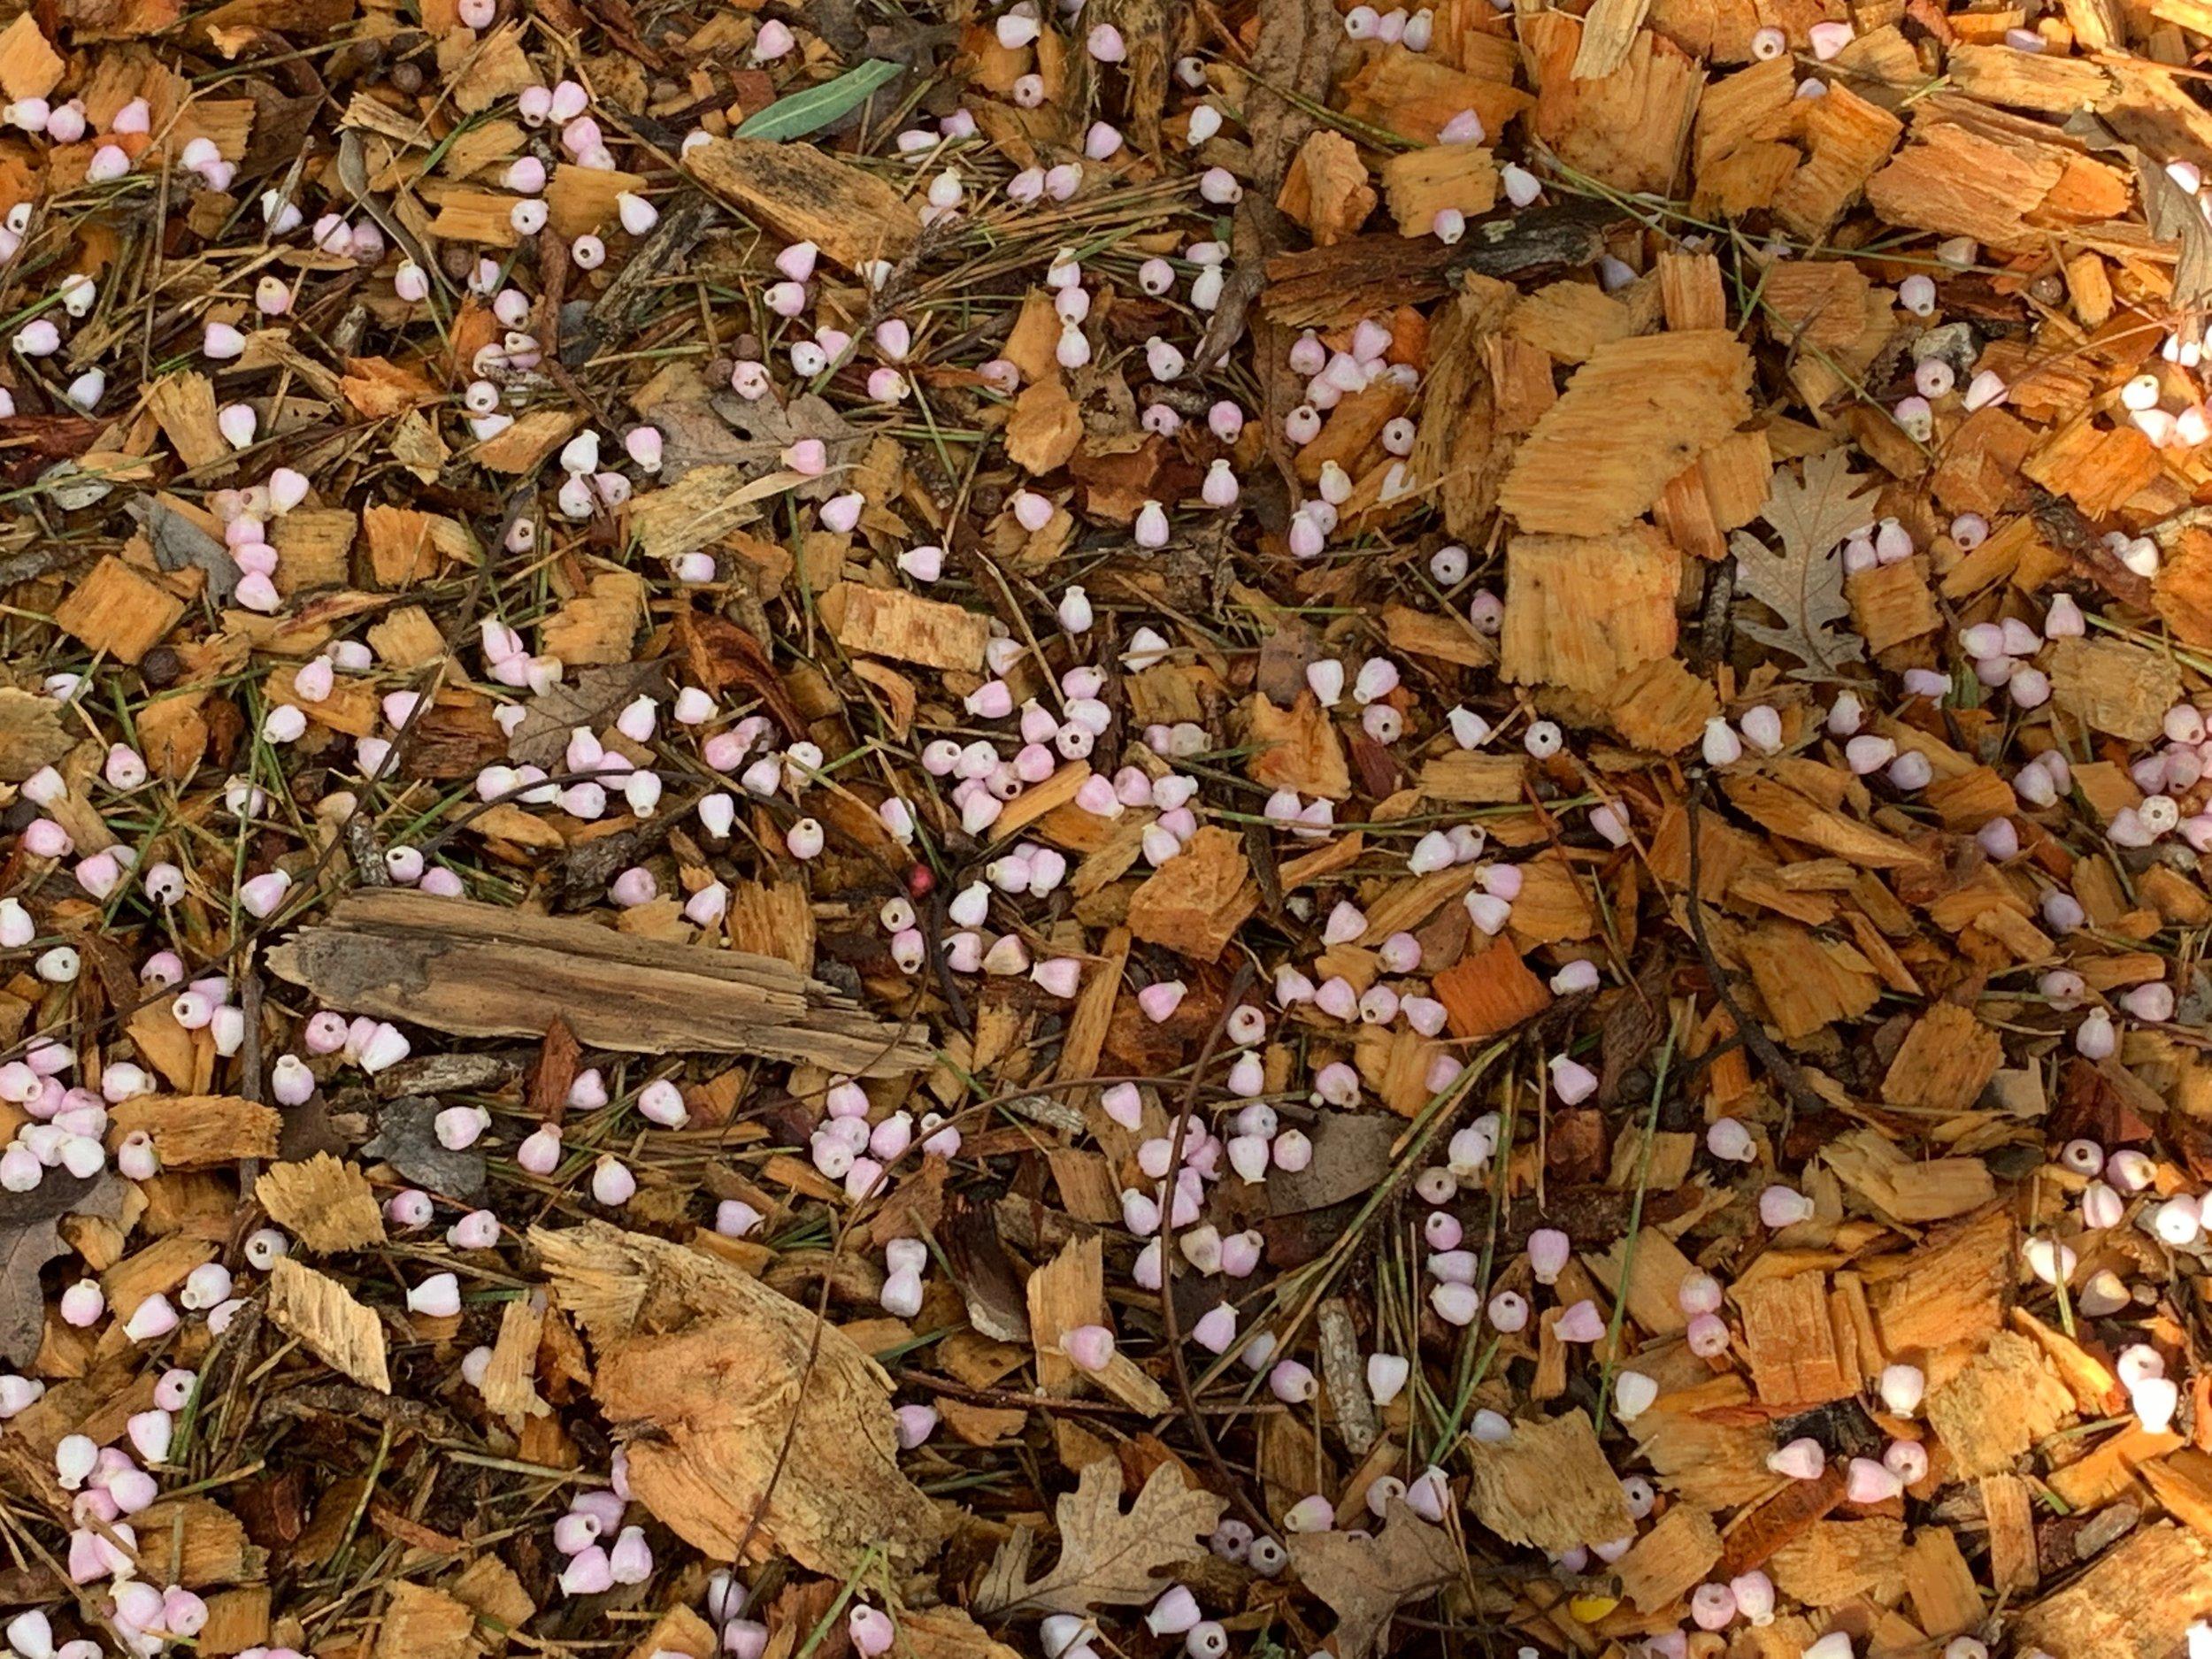 Manzanita blossoms falling to the wood chips below